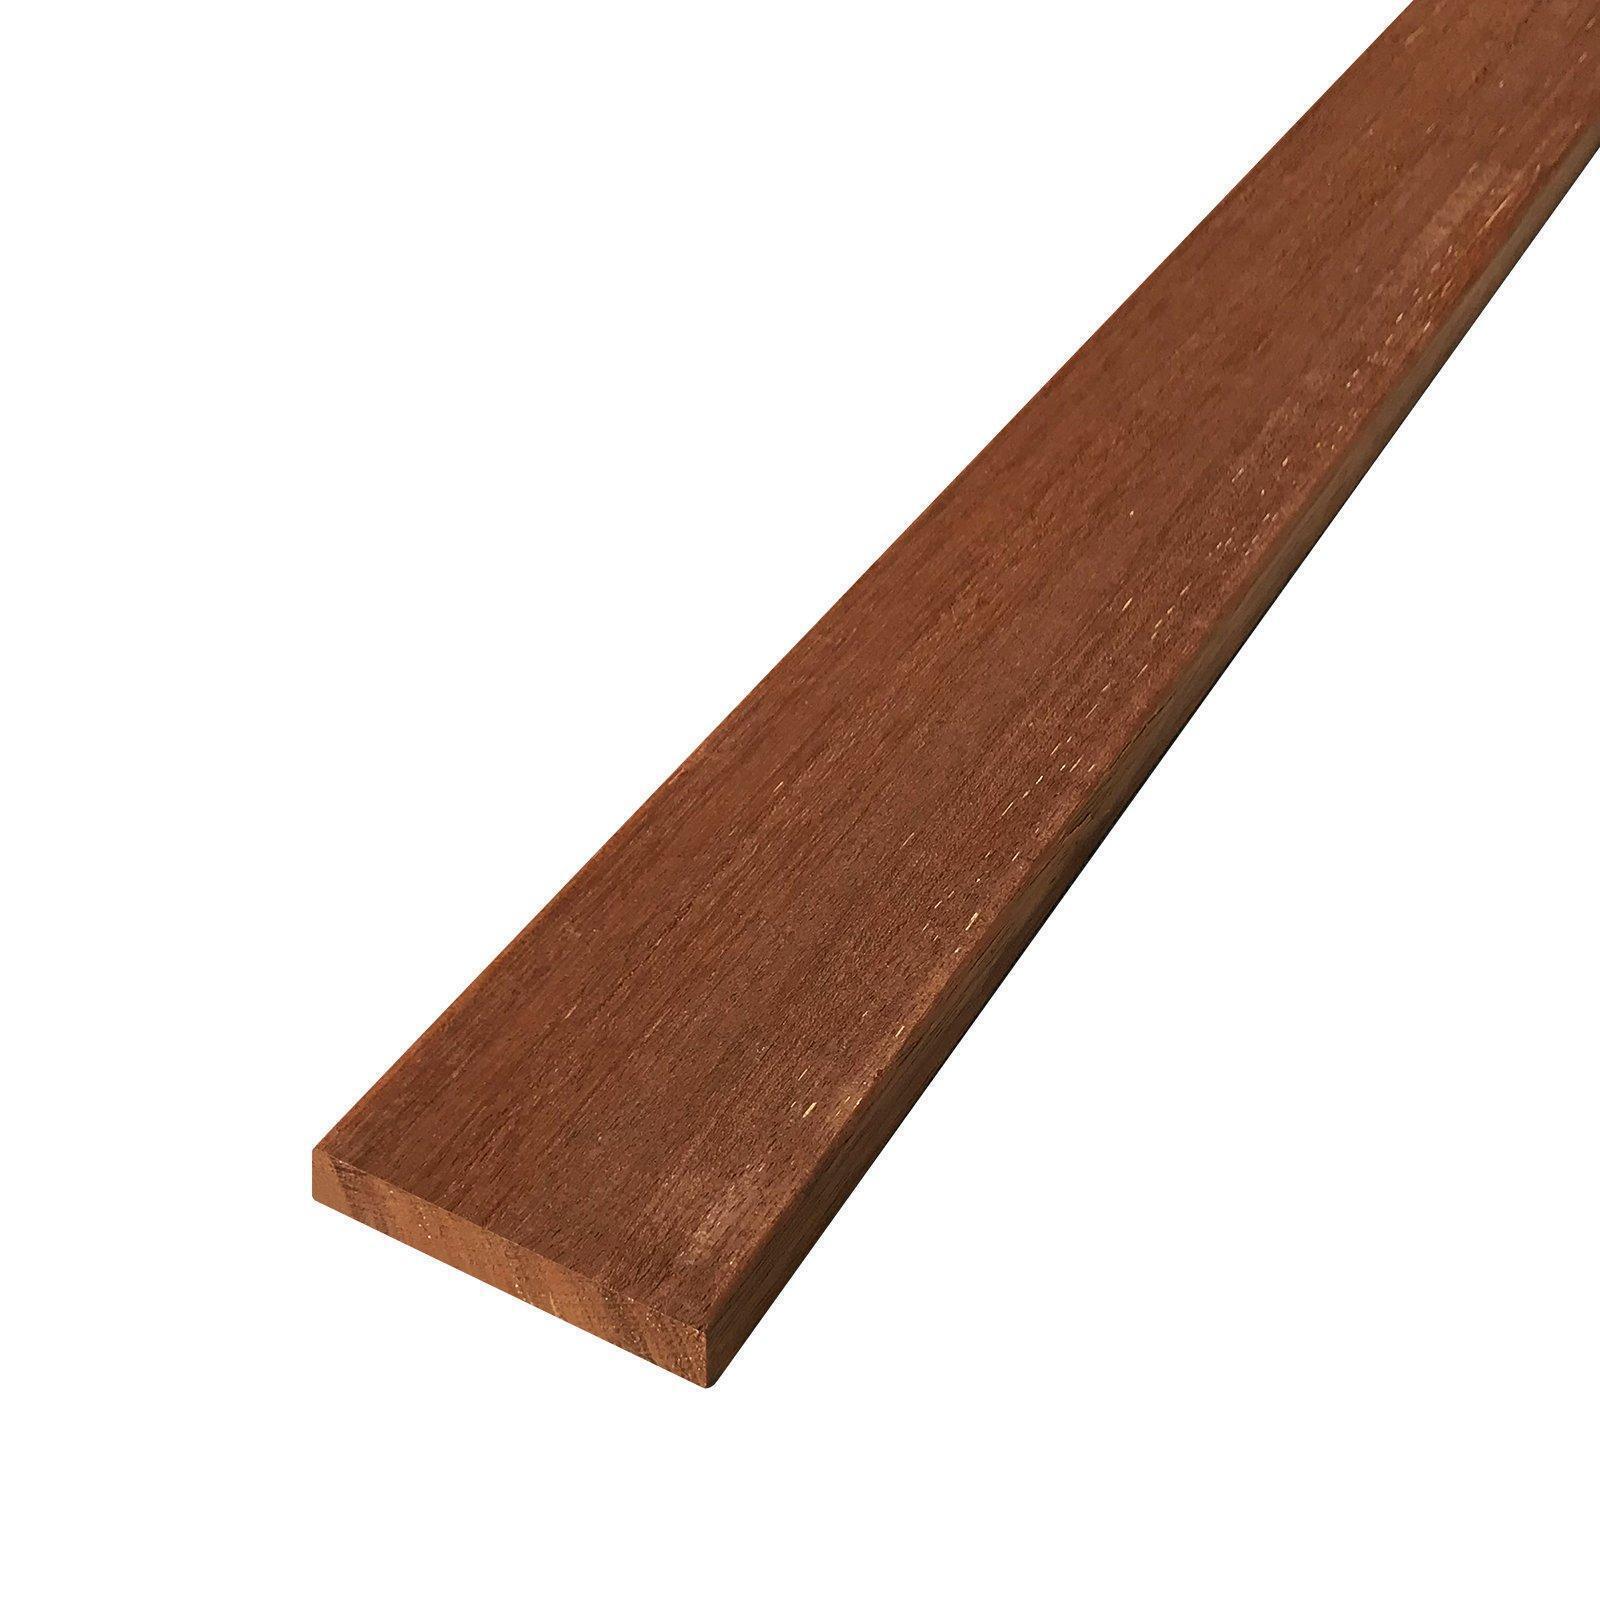 SpecRite 90 x 19mm Pre-Oiled Select Grade Kwila Decking - Per Linear Metre